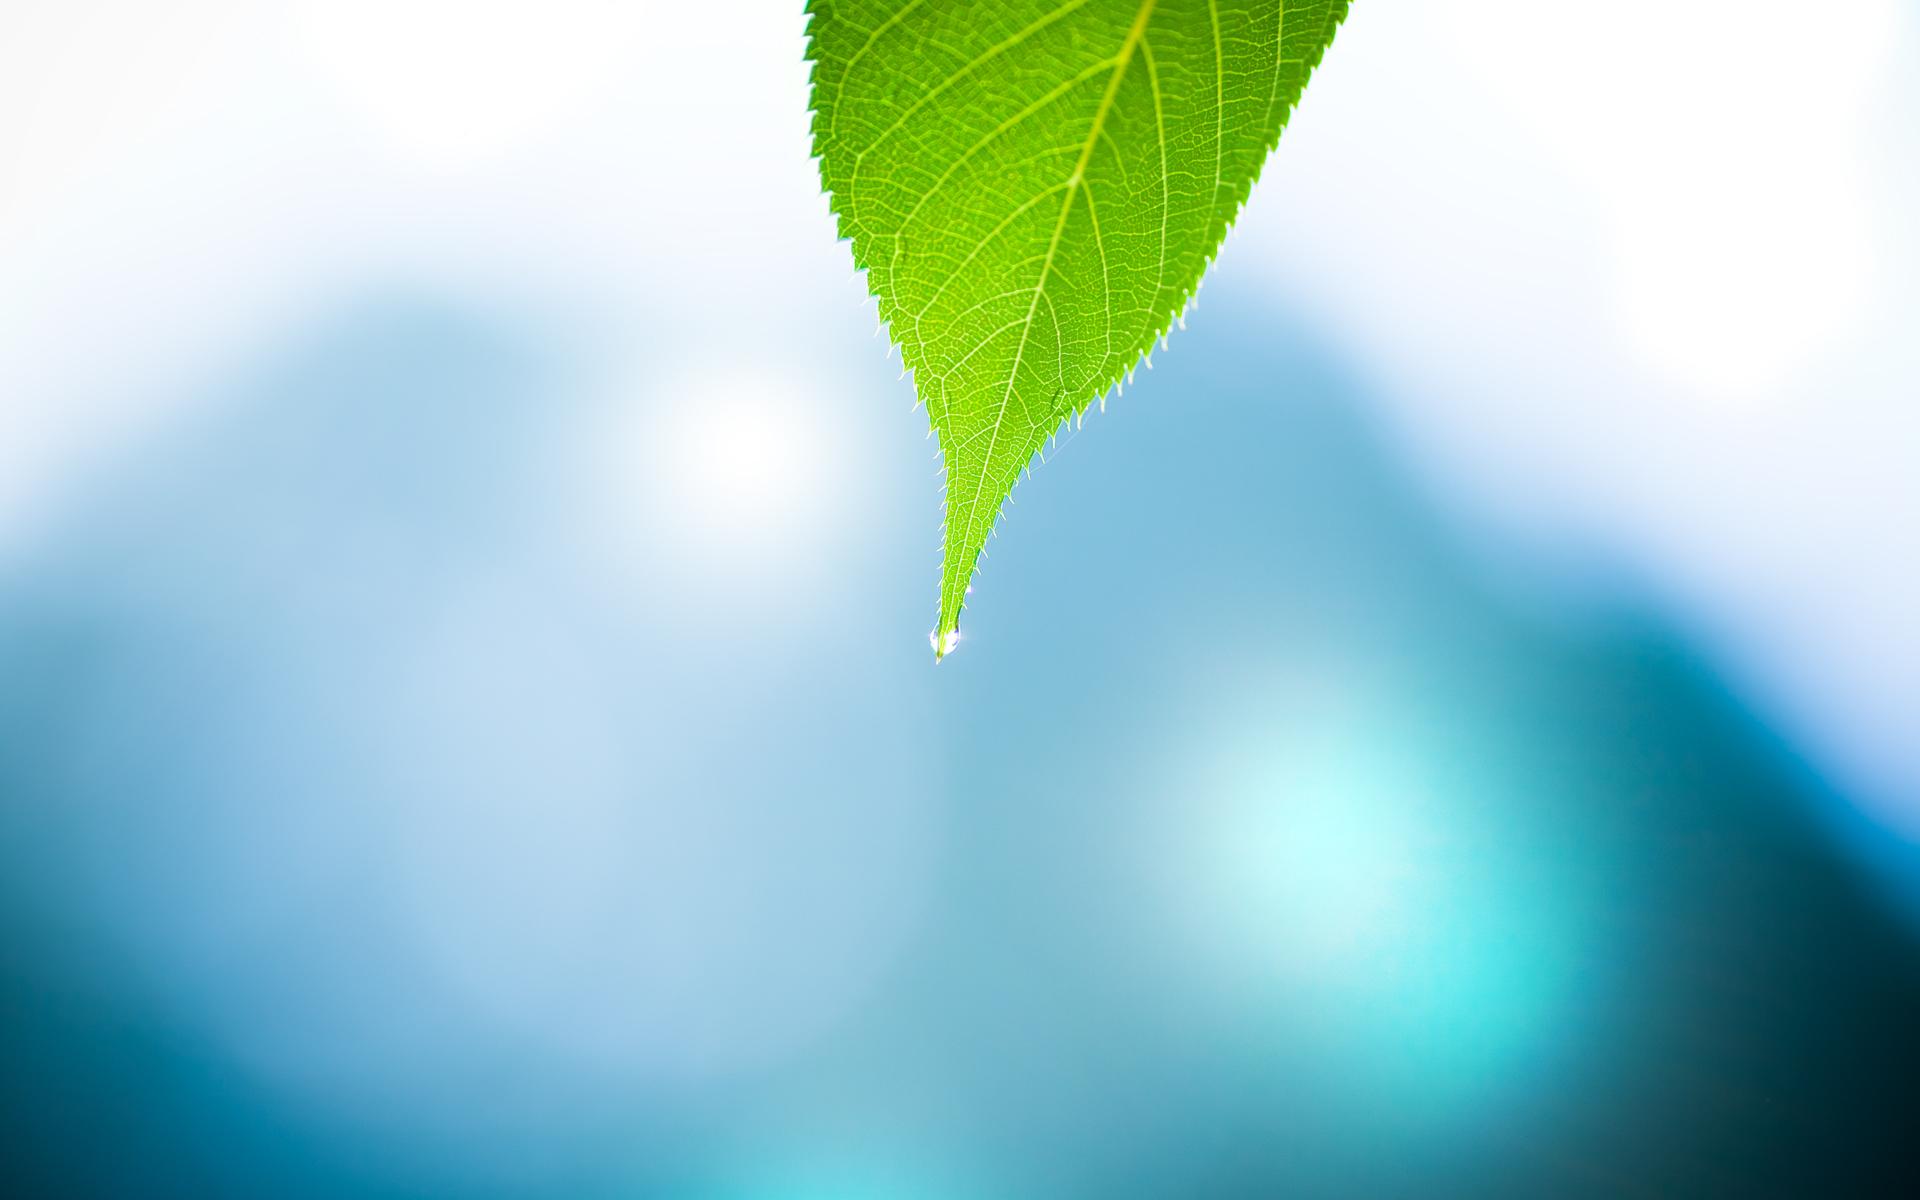 Water Nature Leaf Minimalistic Water 1920 X 1200